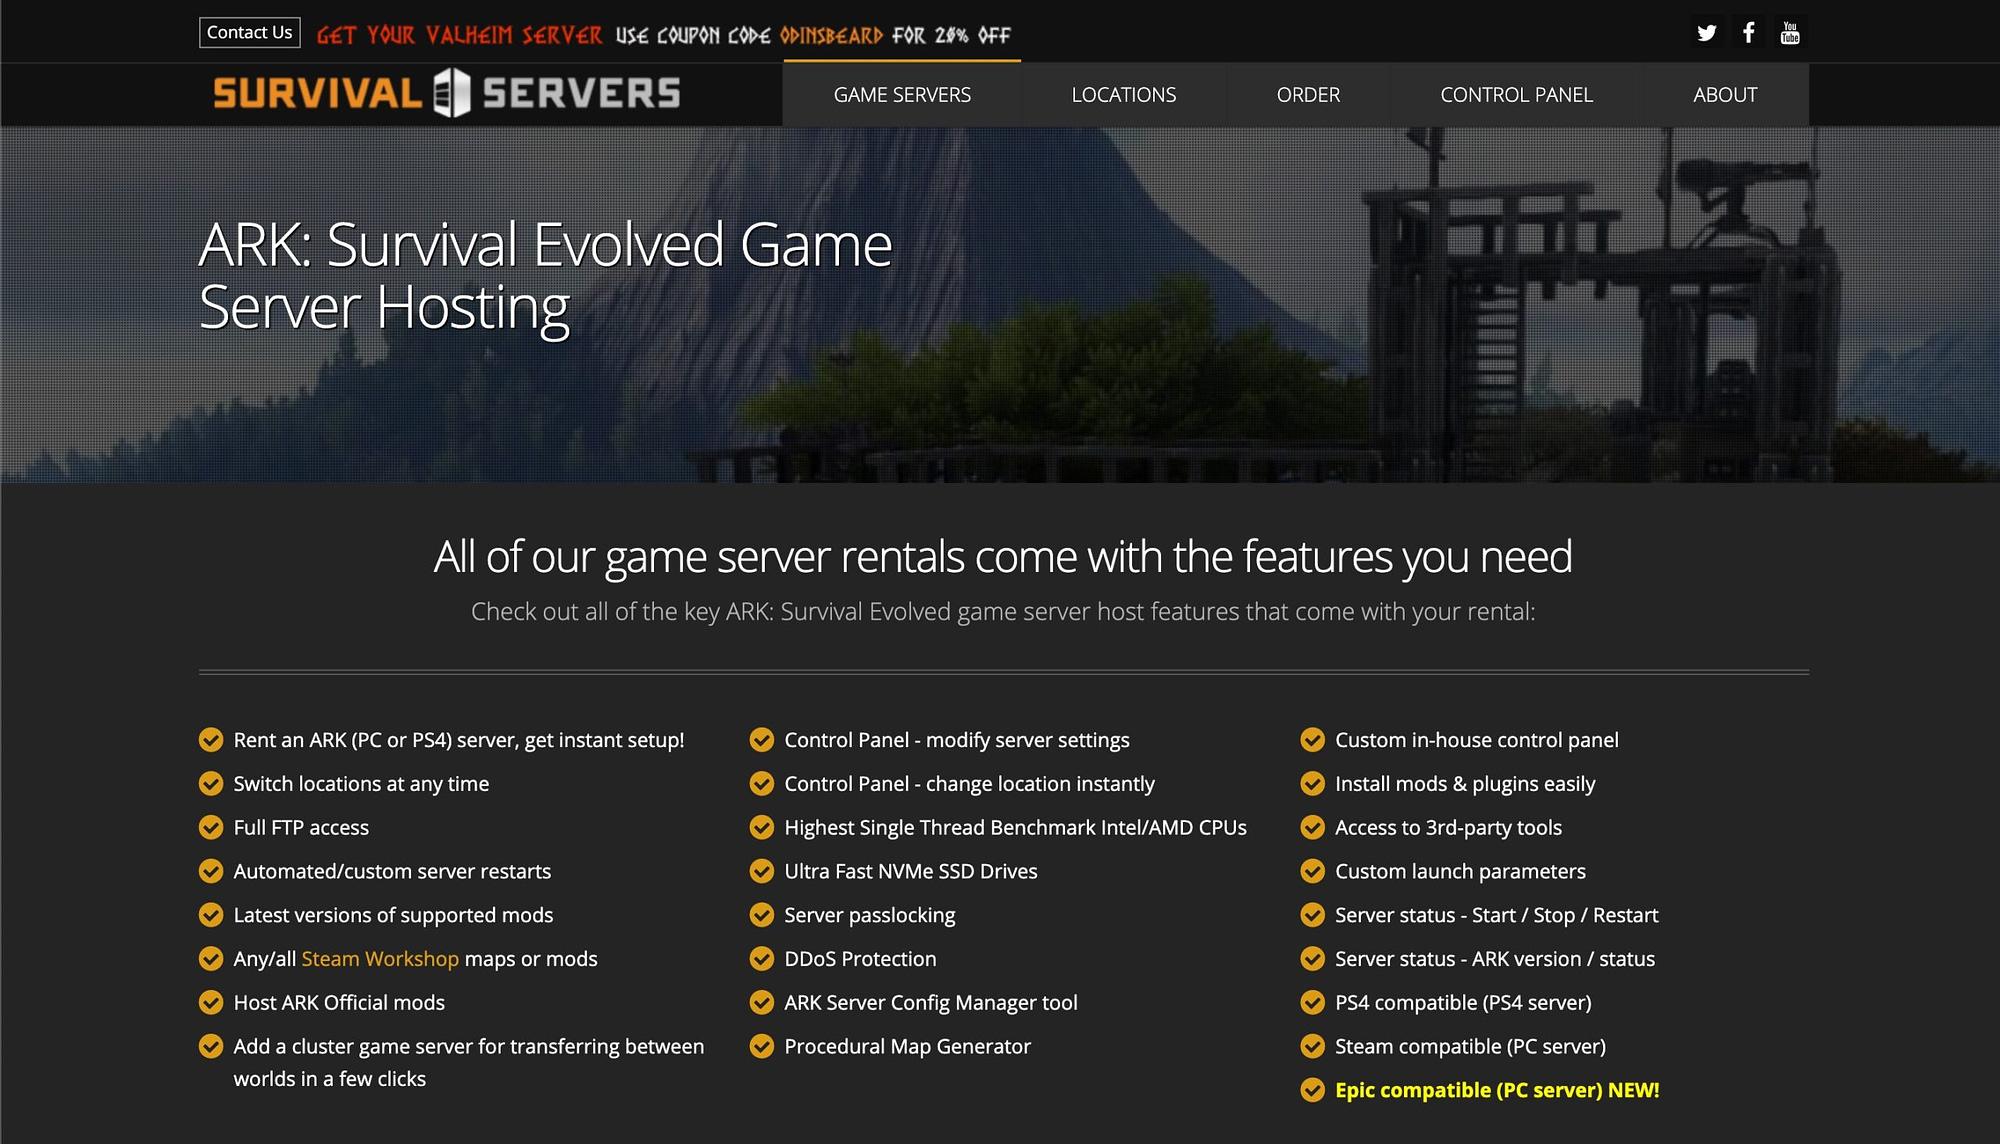 Survival Servers